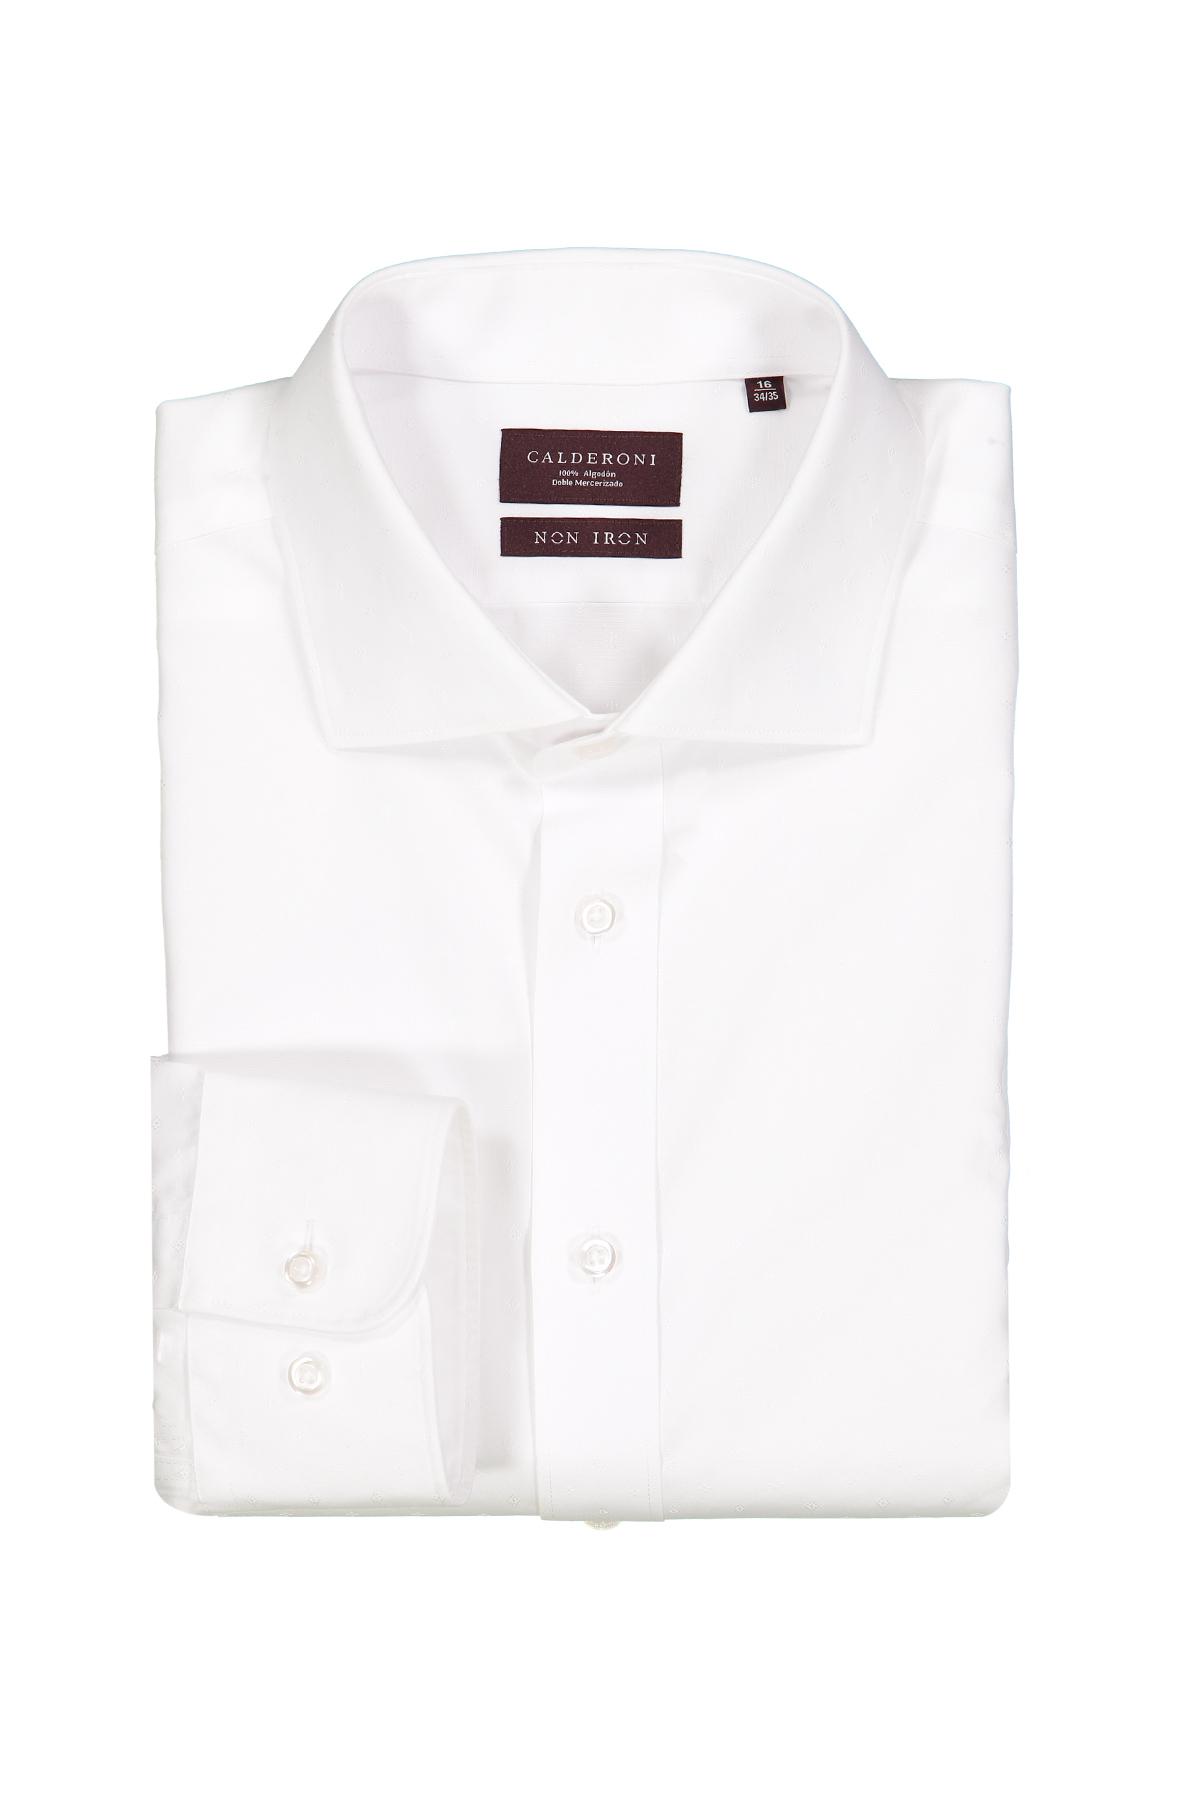 Camisa Calderoni -Non Iron DP4- jacquard blanco liso.